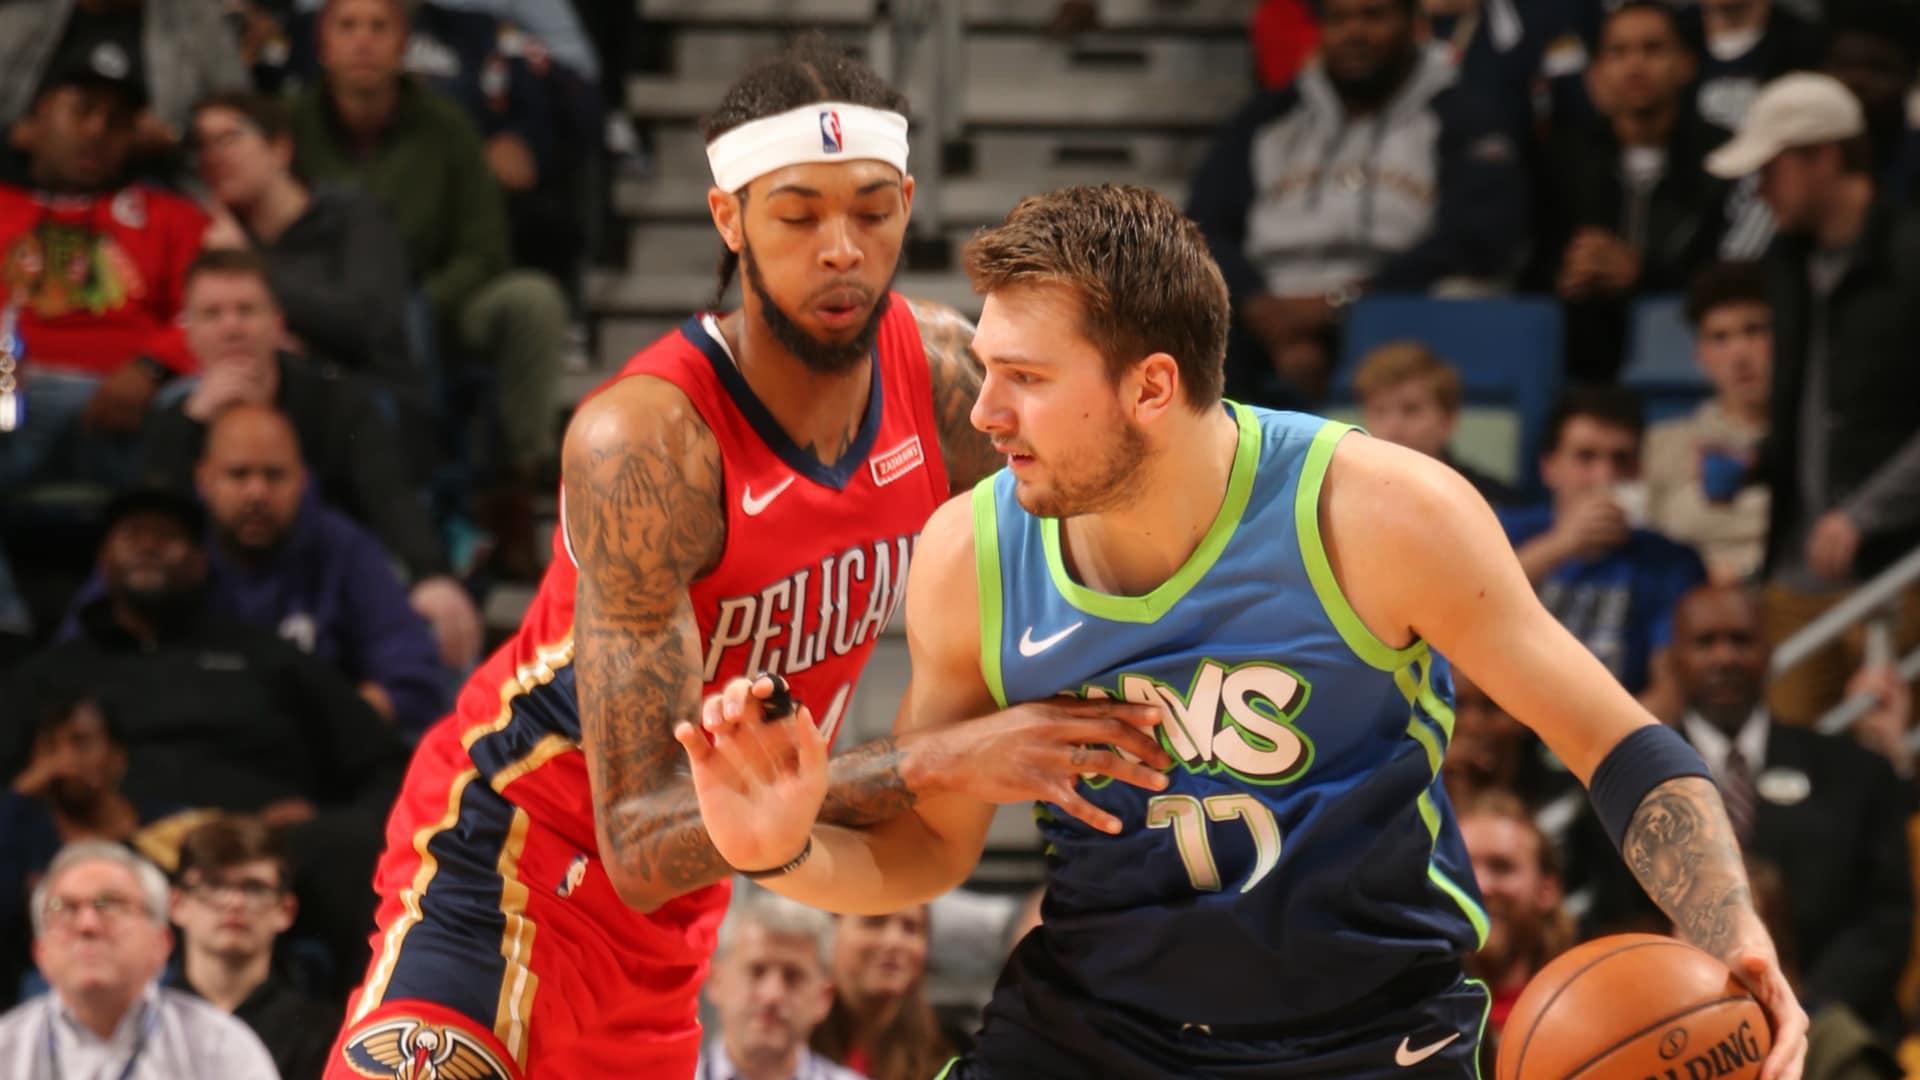 Mavericks @ Pelicans